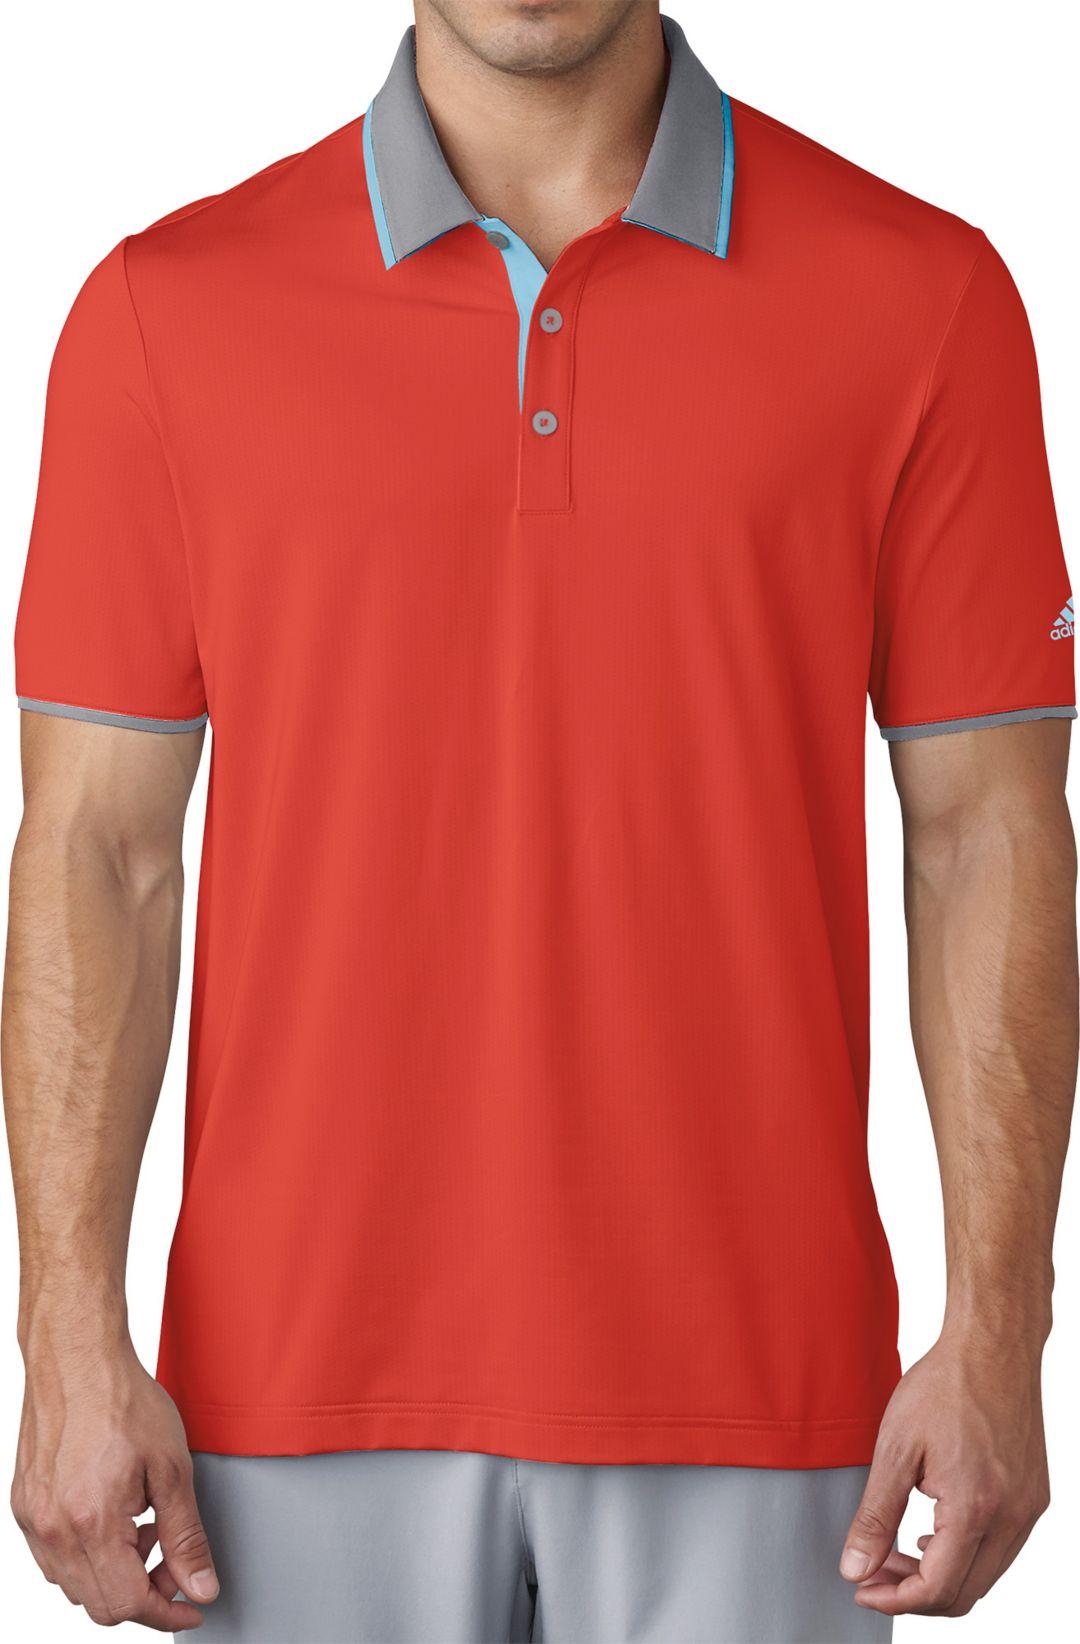 1d365dd7 adidas Men's climacool Performance Golf Polo